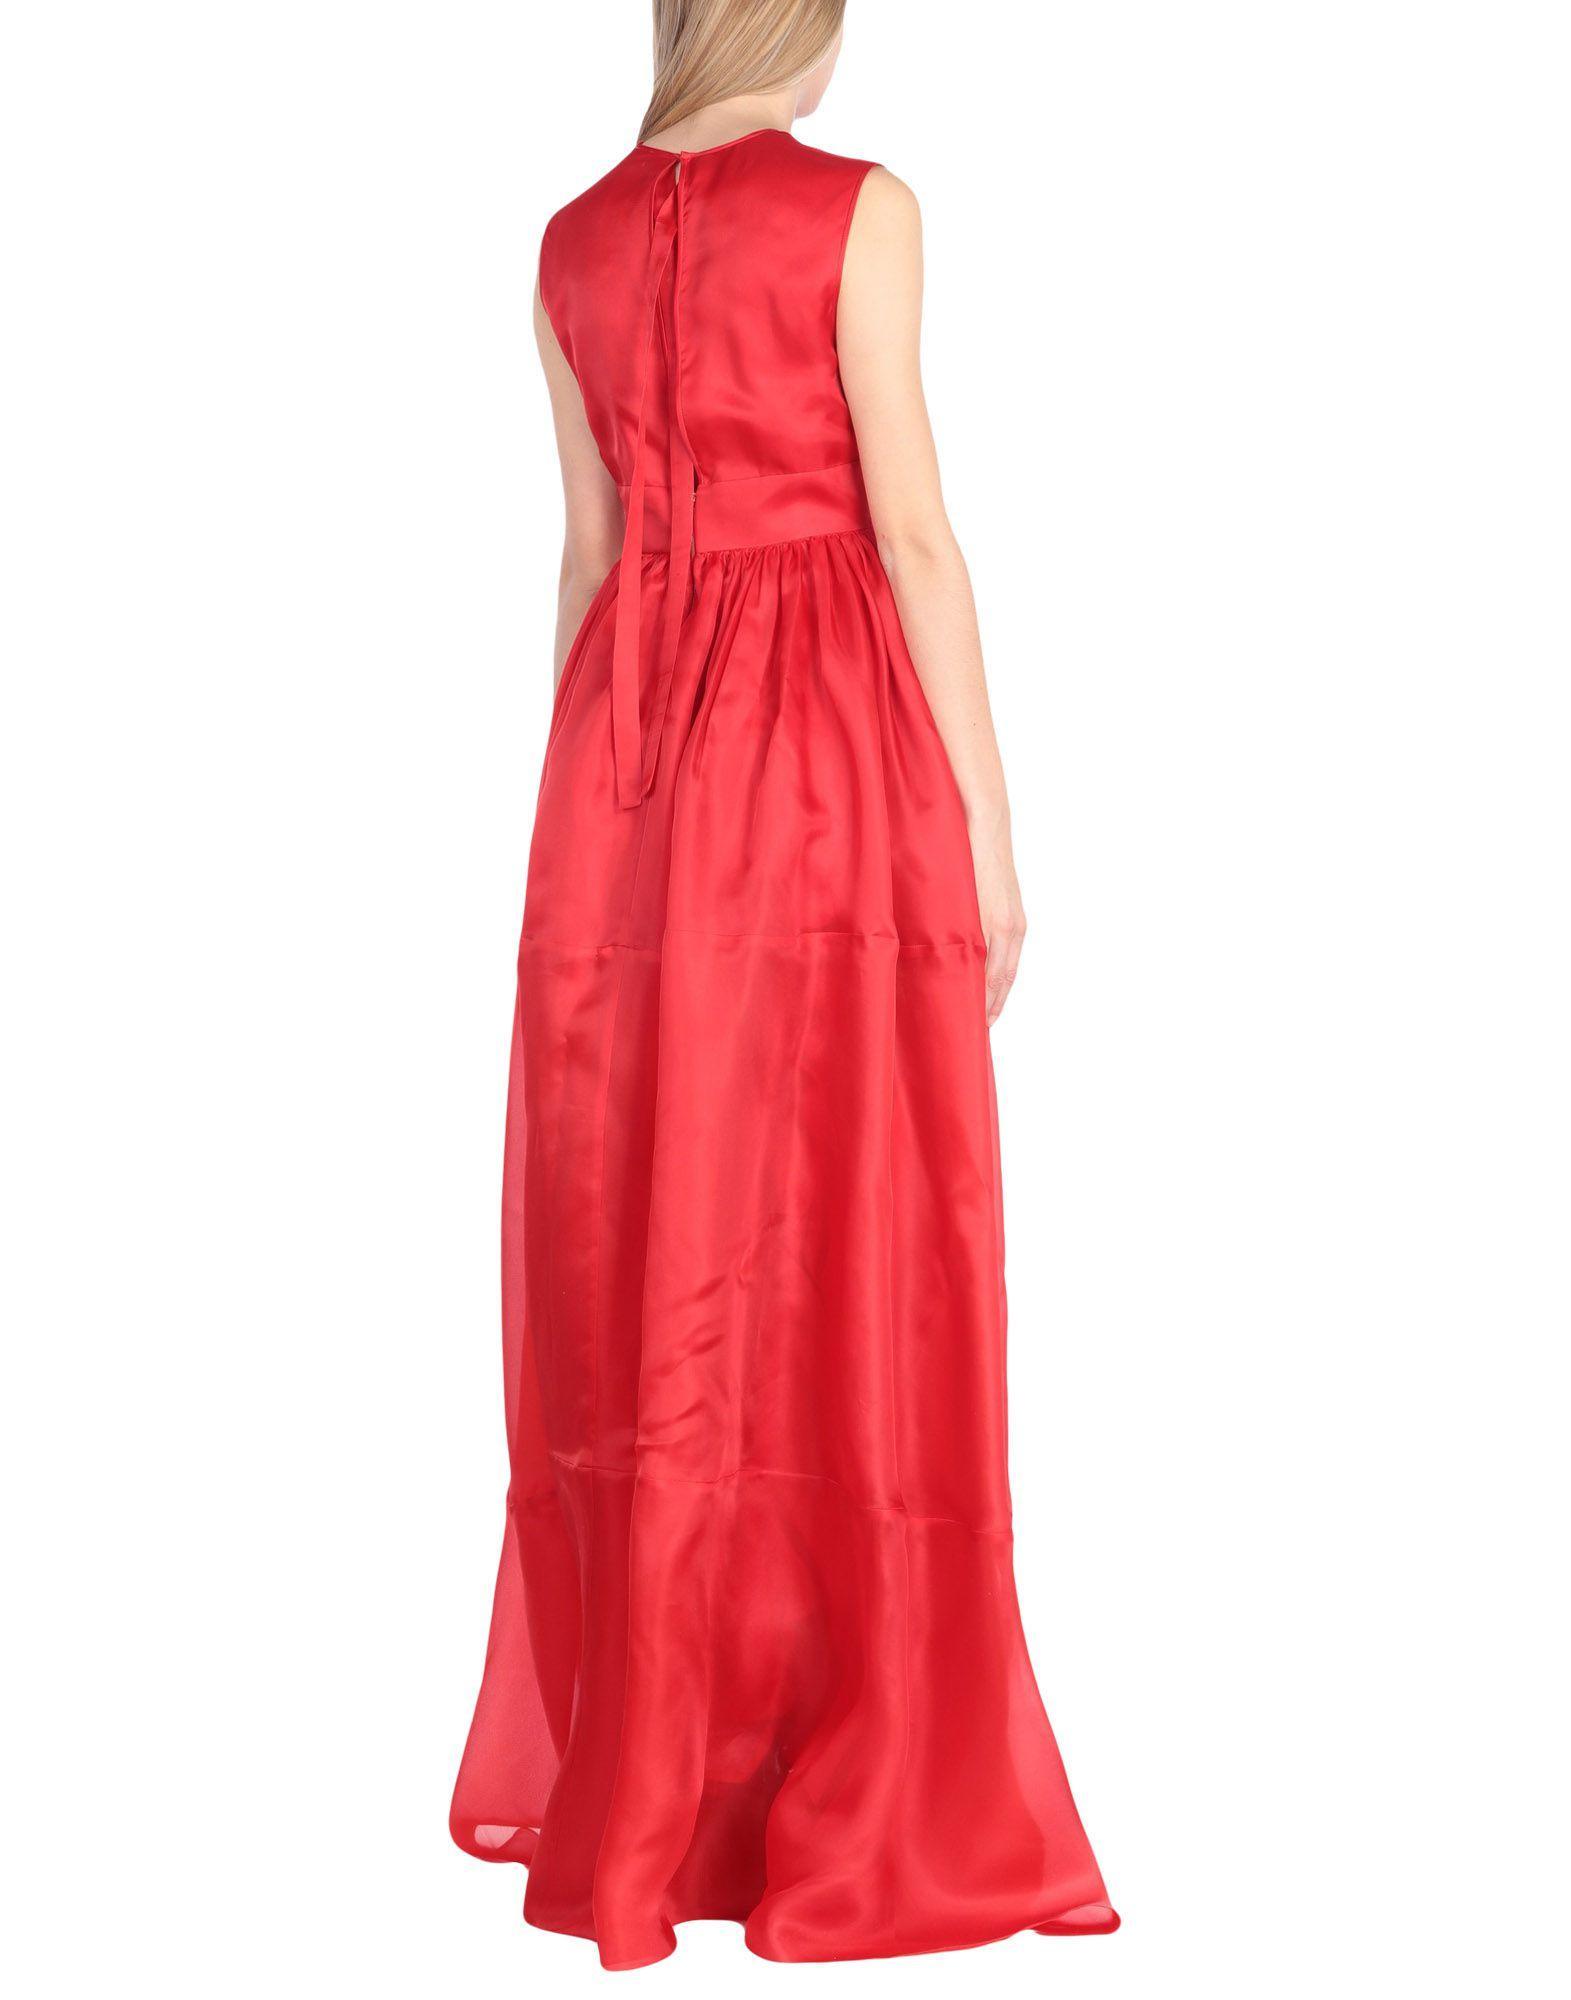 8526311efed Lyst - Robe longue Rochas en coloris Rouge